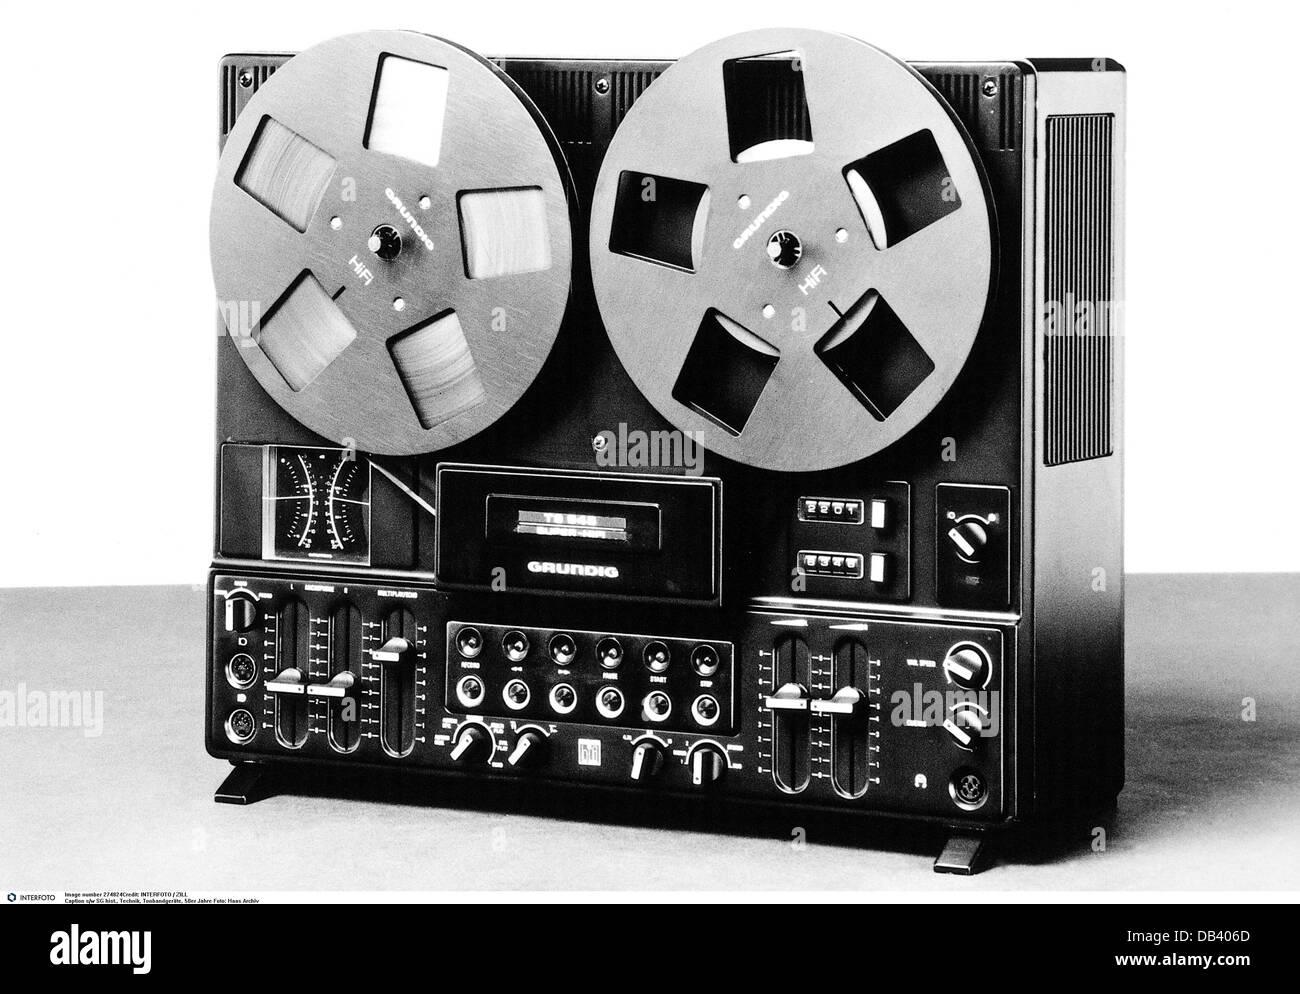 Technics Tonband 1950er Jahre 50er Jahre 20. Jahrhundert historischen historischen Elektronik Elektrogeräte Stockbild